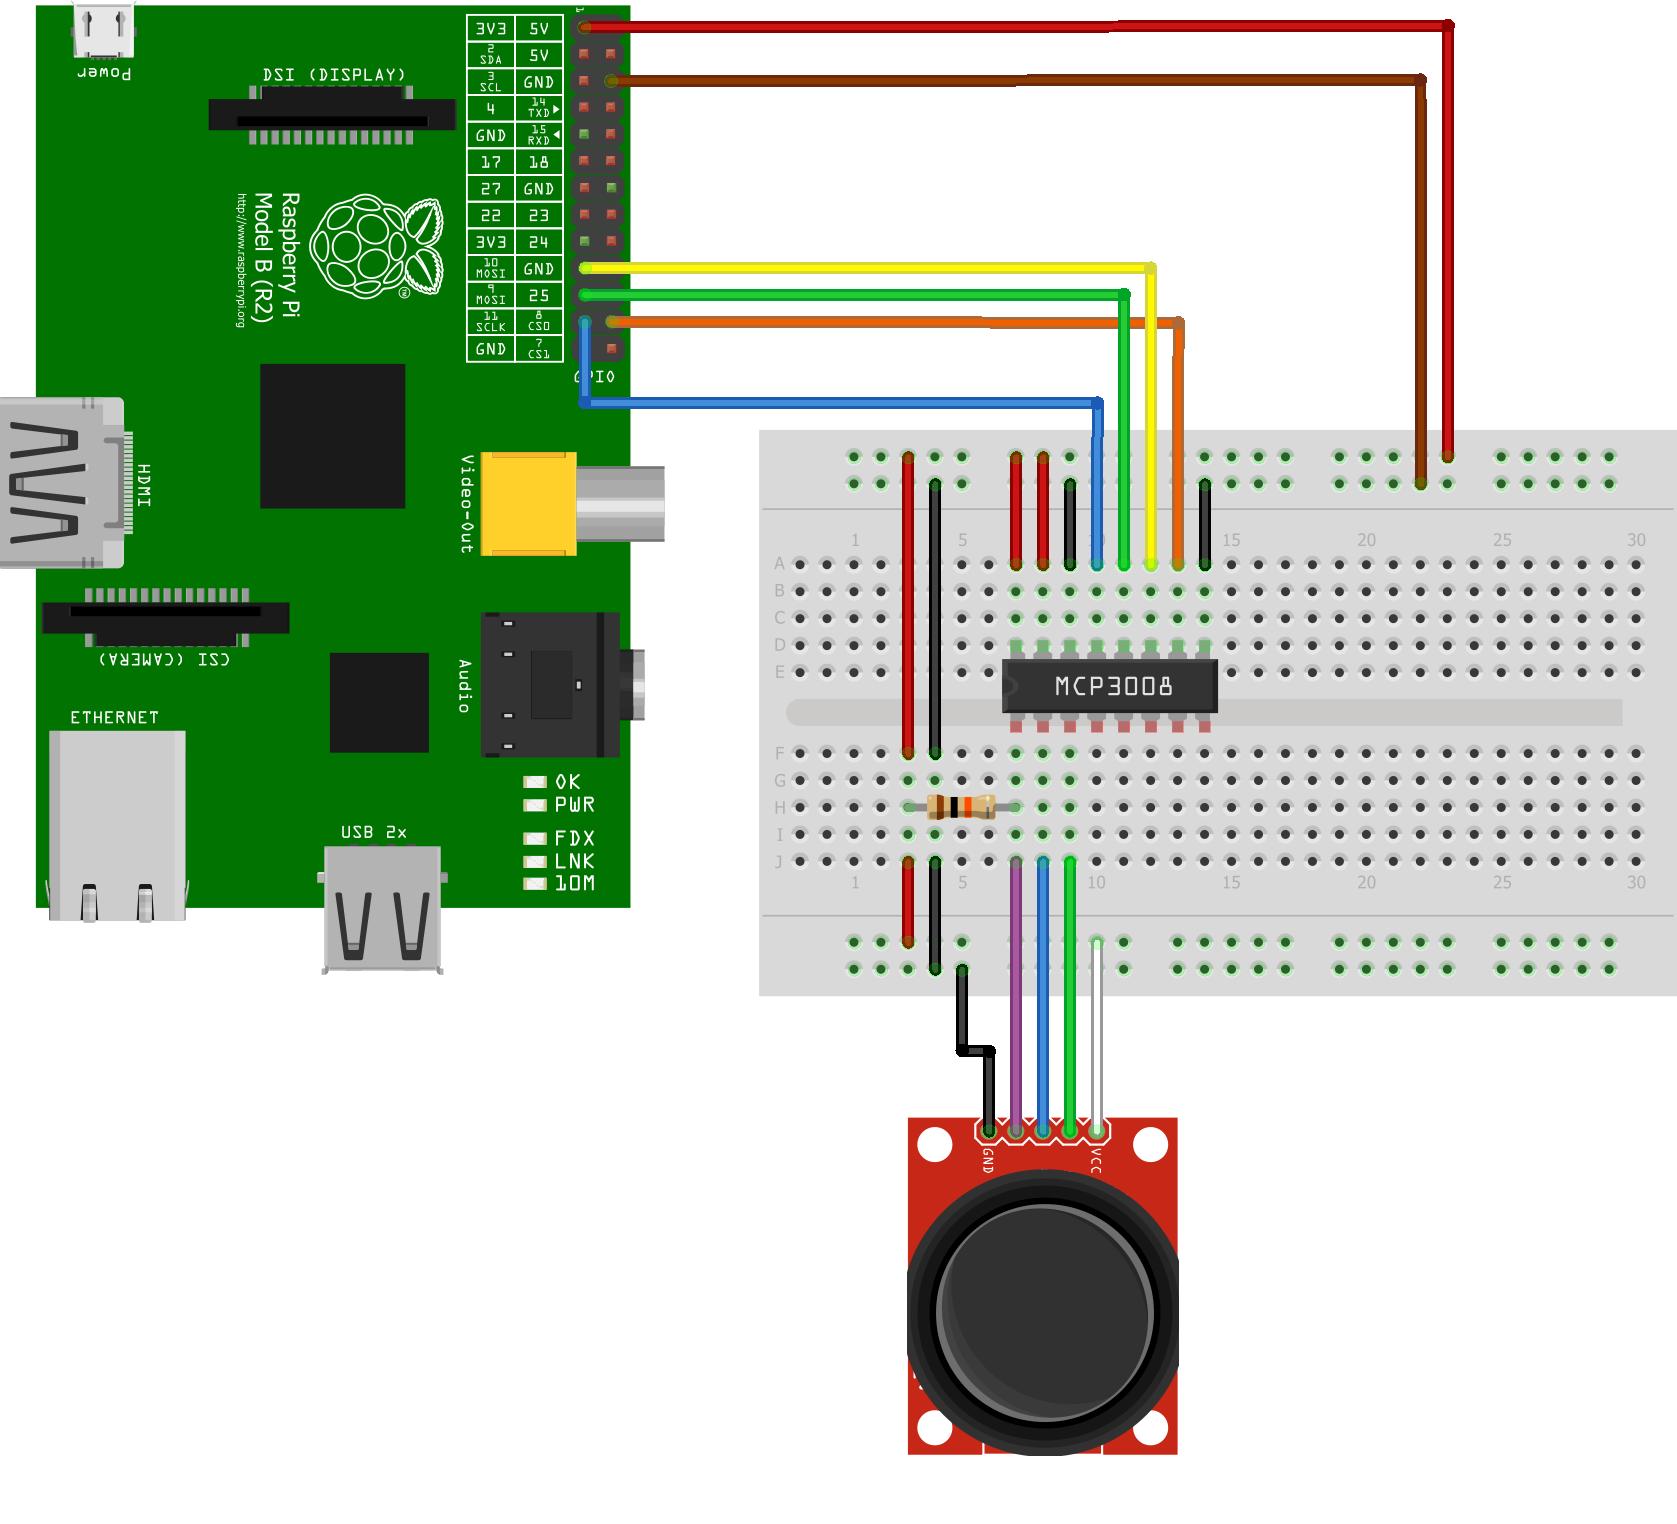 mcp3008 joystick raspberry pi spy. Black Bedroom Furniture Sets. Home Design Ideas